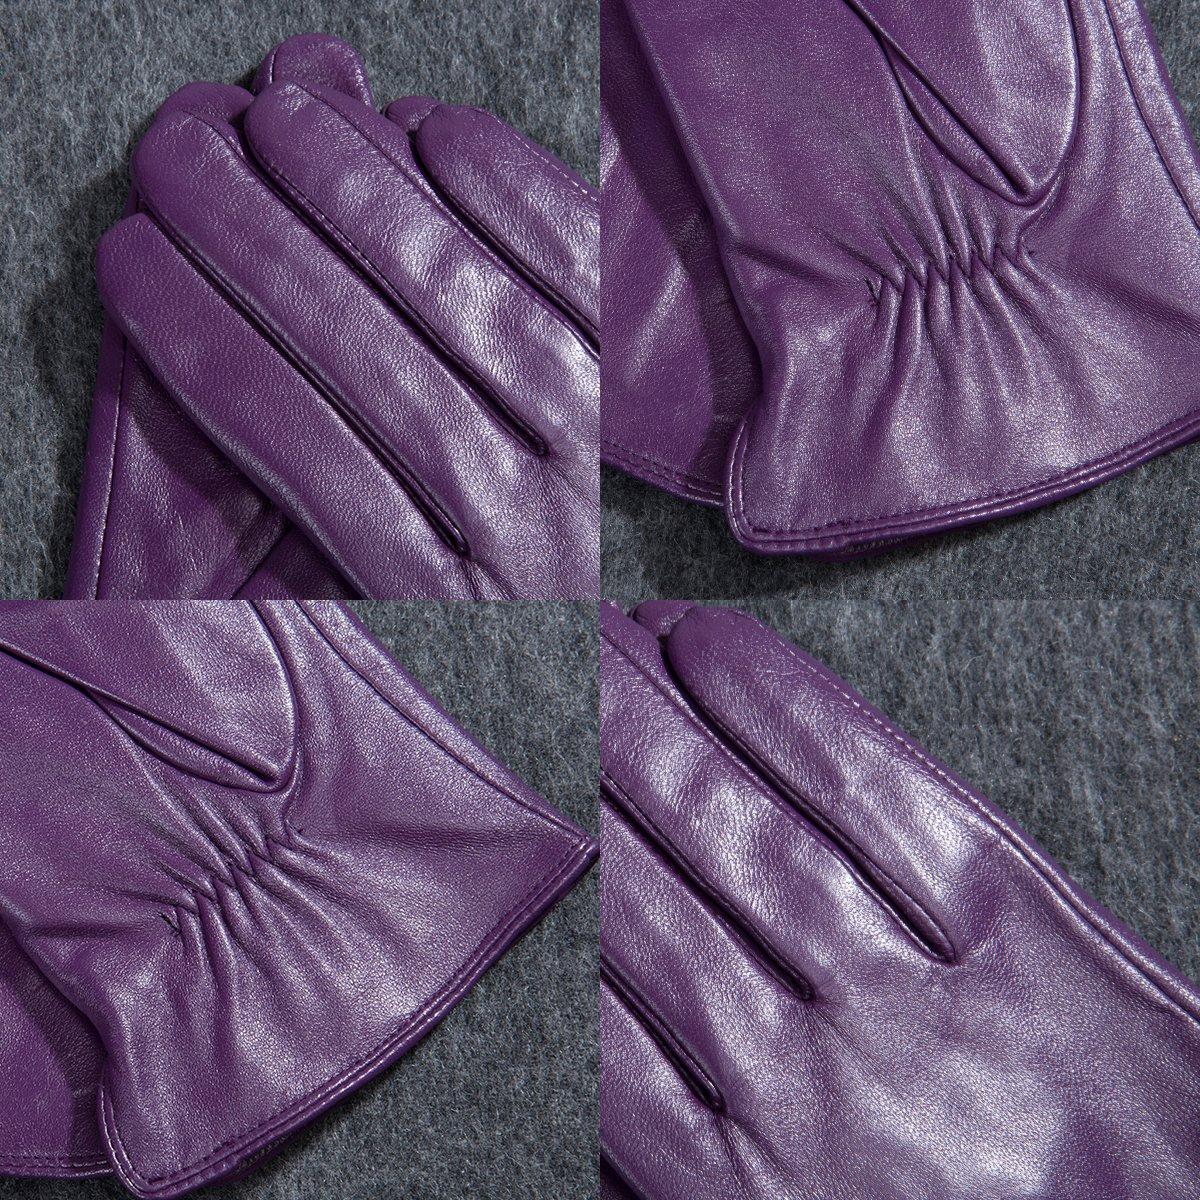 Kursheuel 14 colors Cashmere Women Lady's Genuine lambskin soft leather driving Gloves KU141 (L, Purple) by Kursheuel (Image #7)